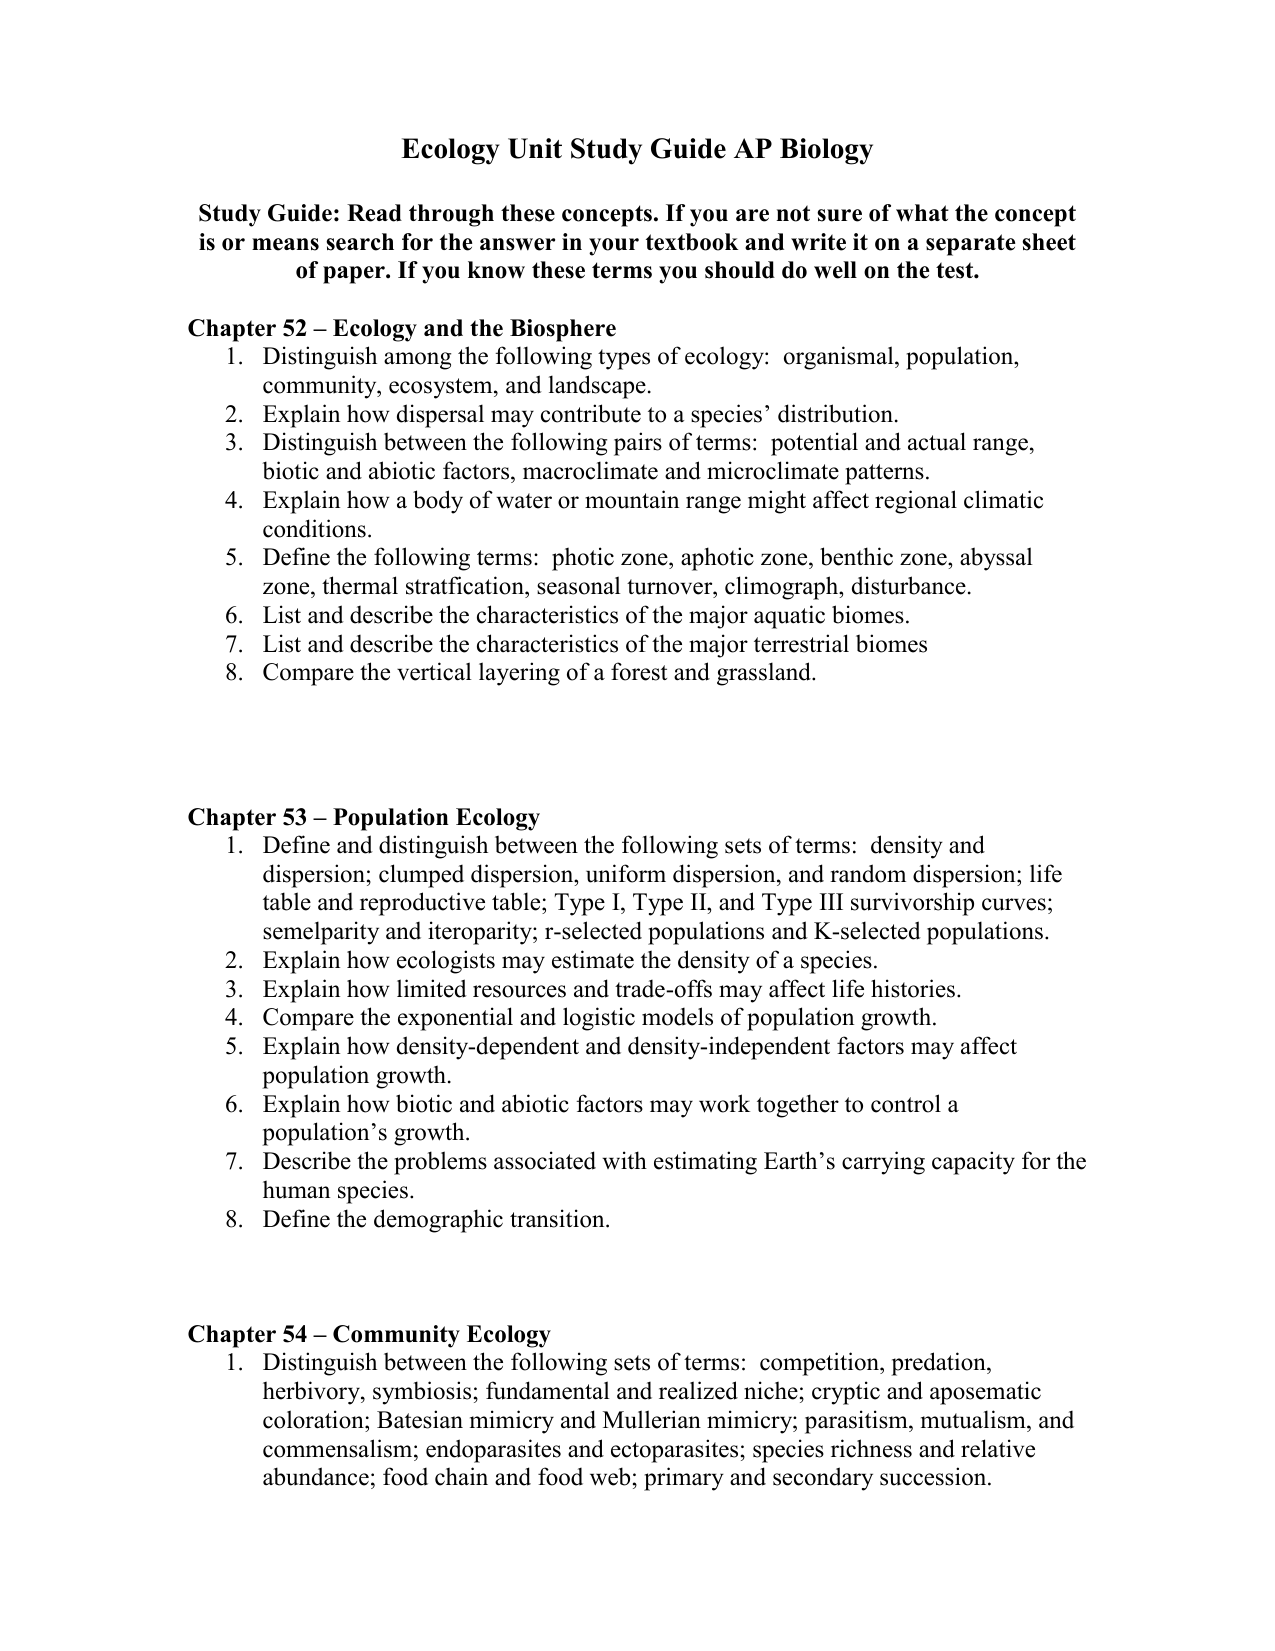 ecology research paper pdf